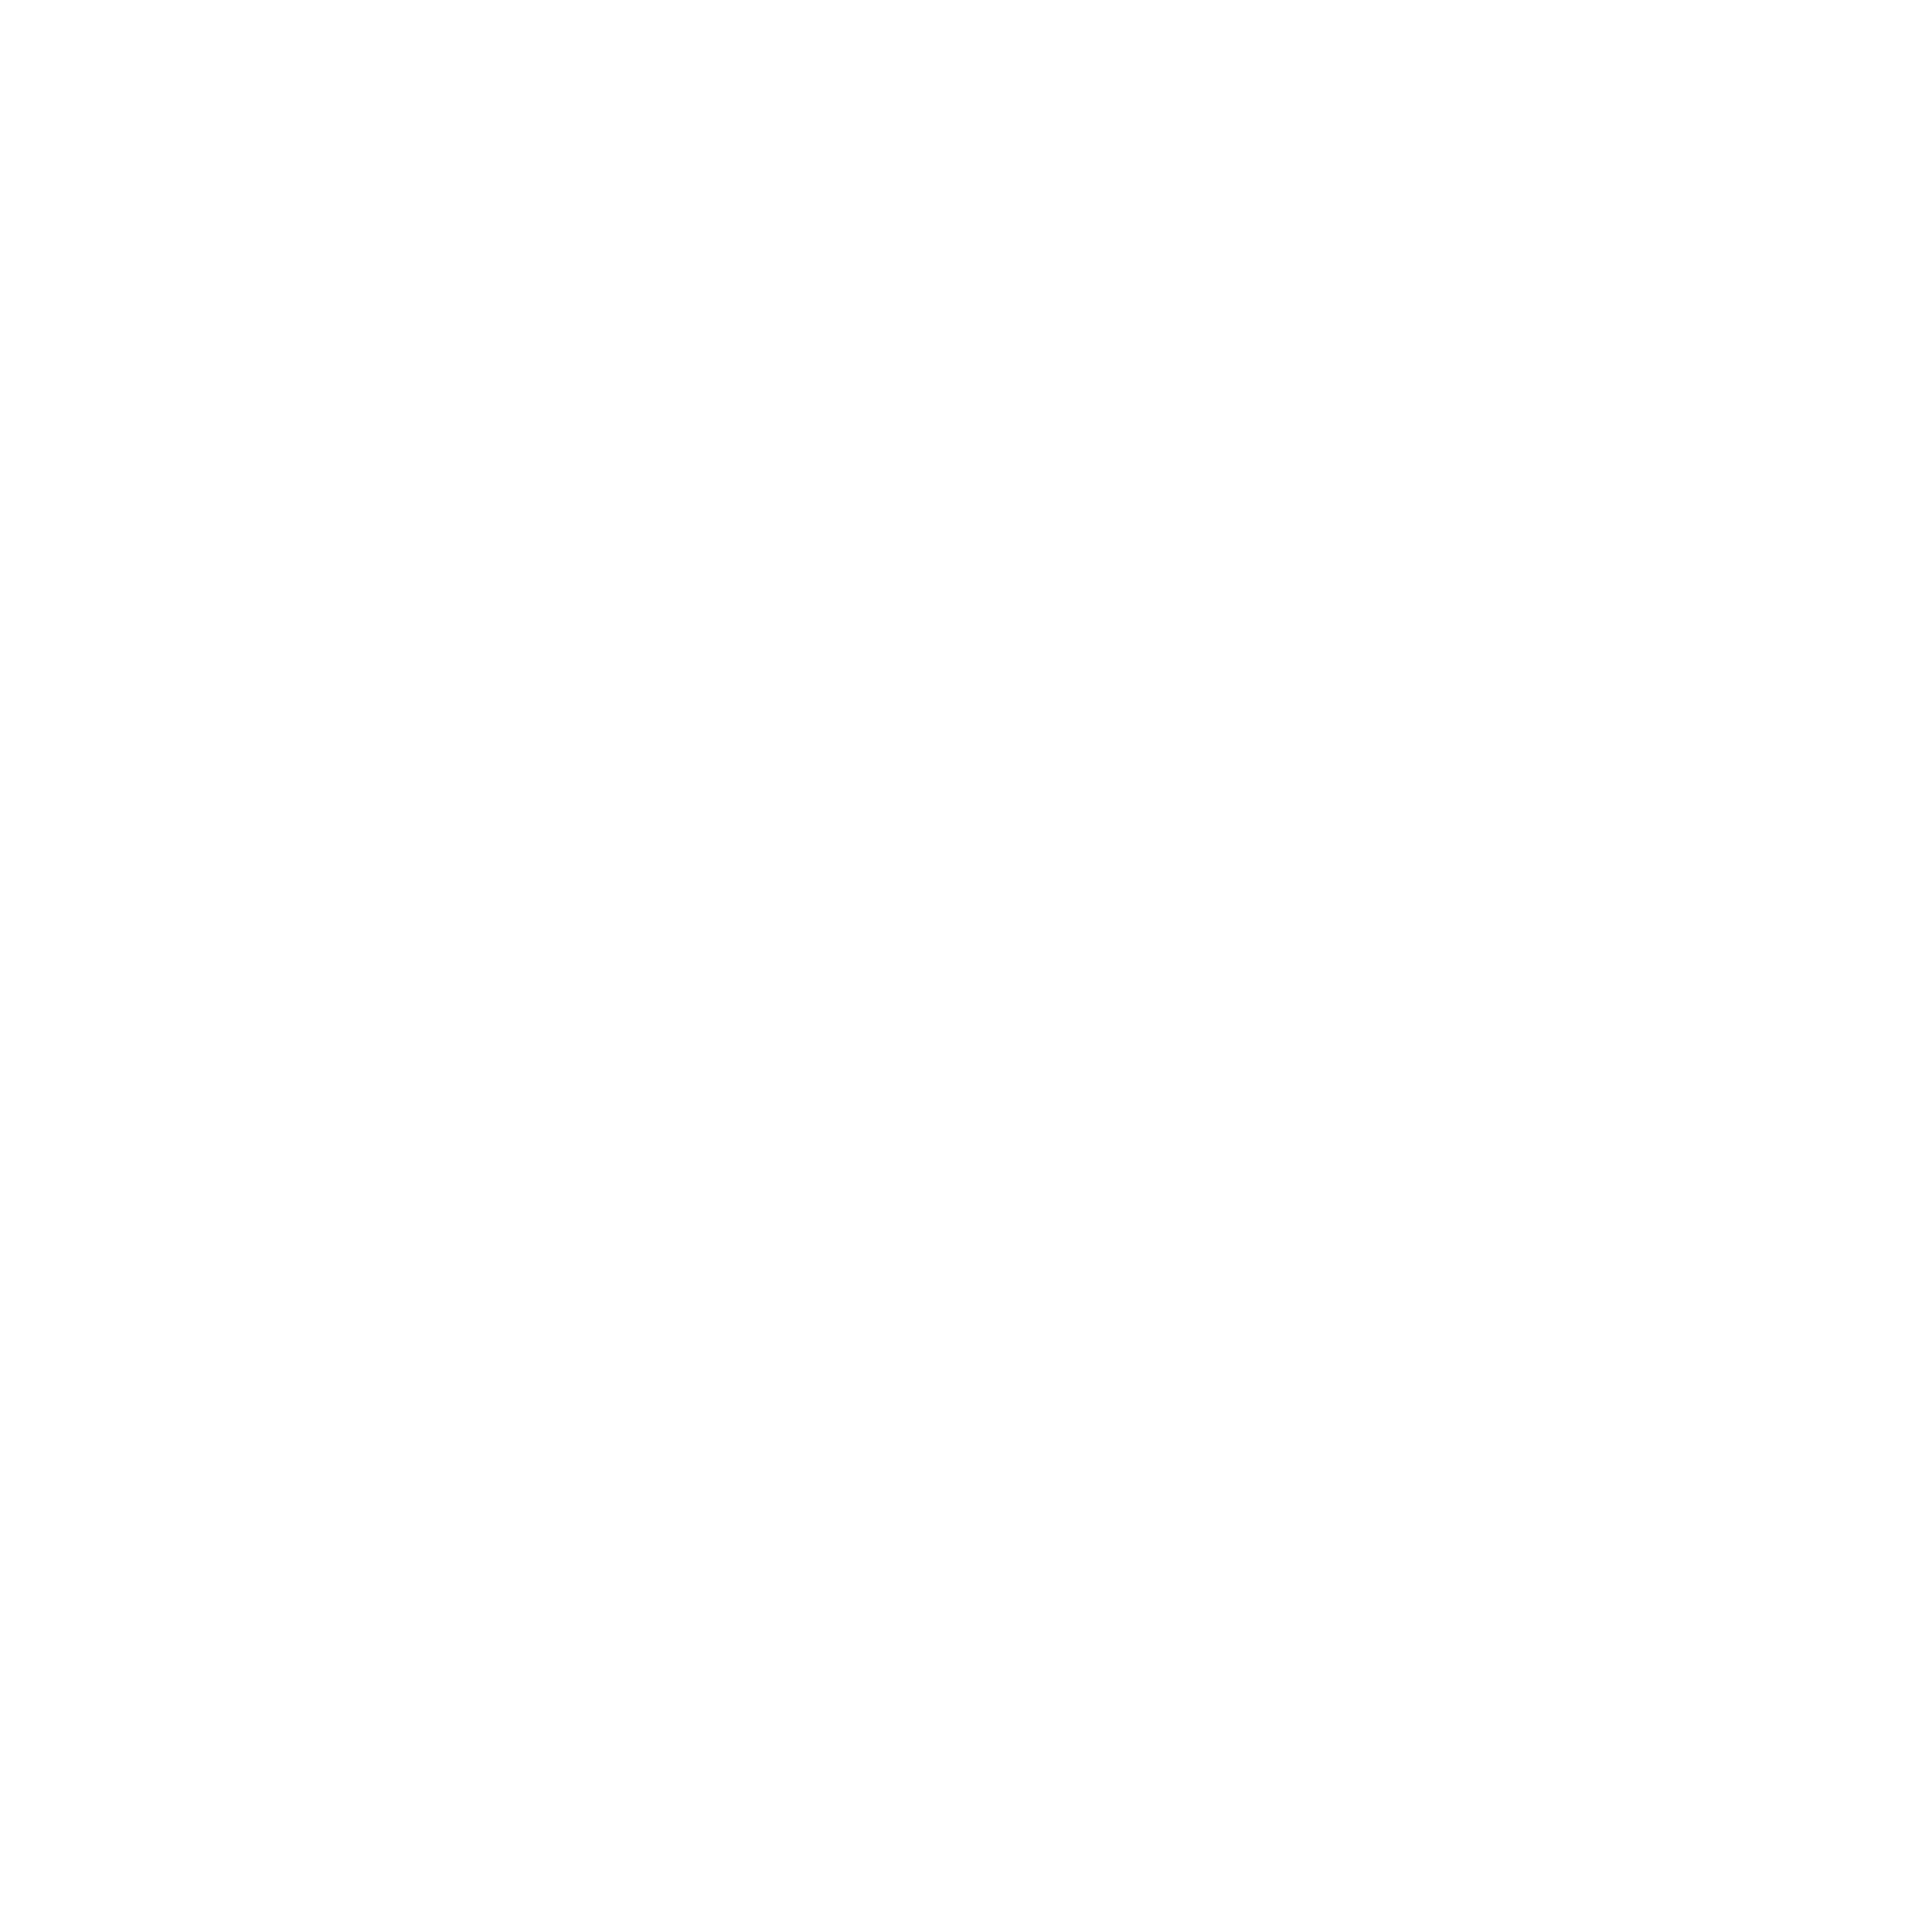 file2-6